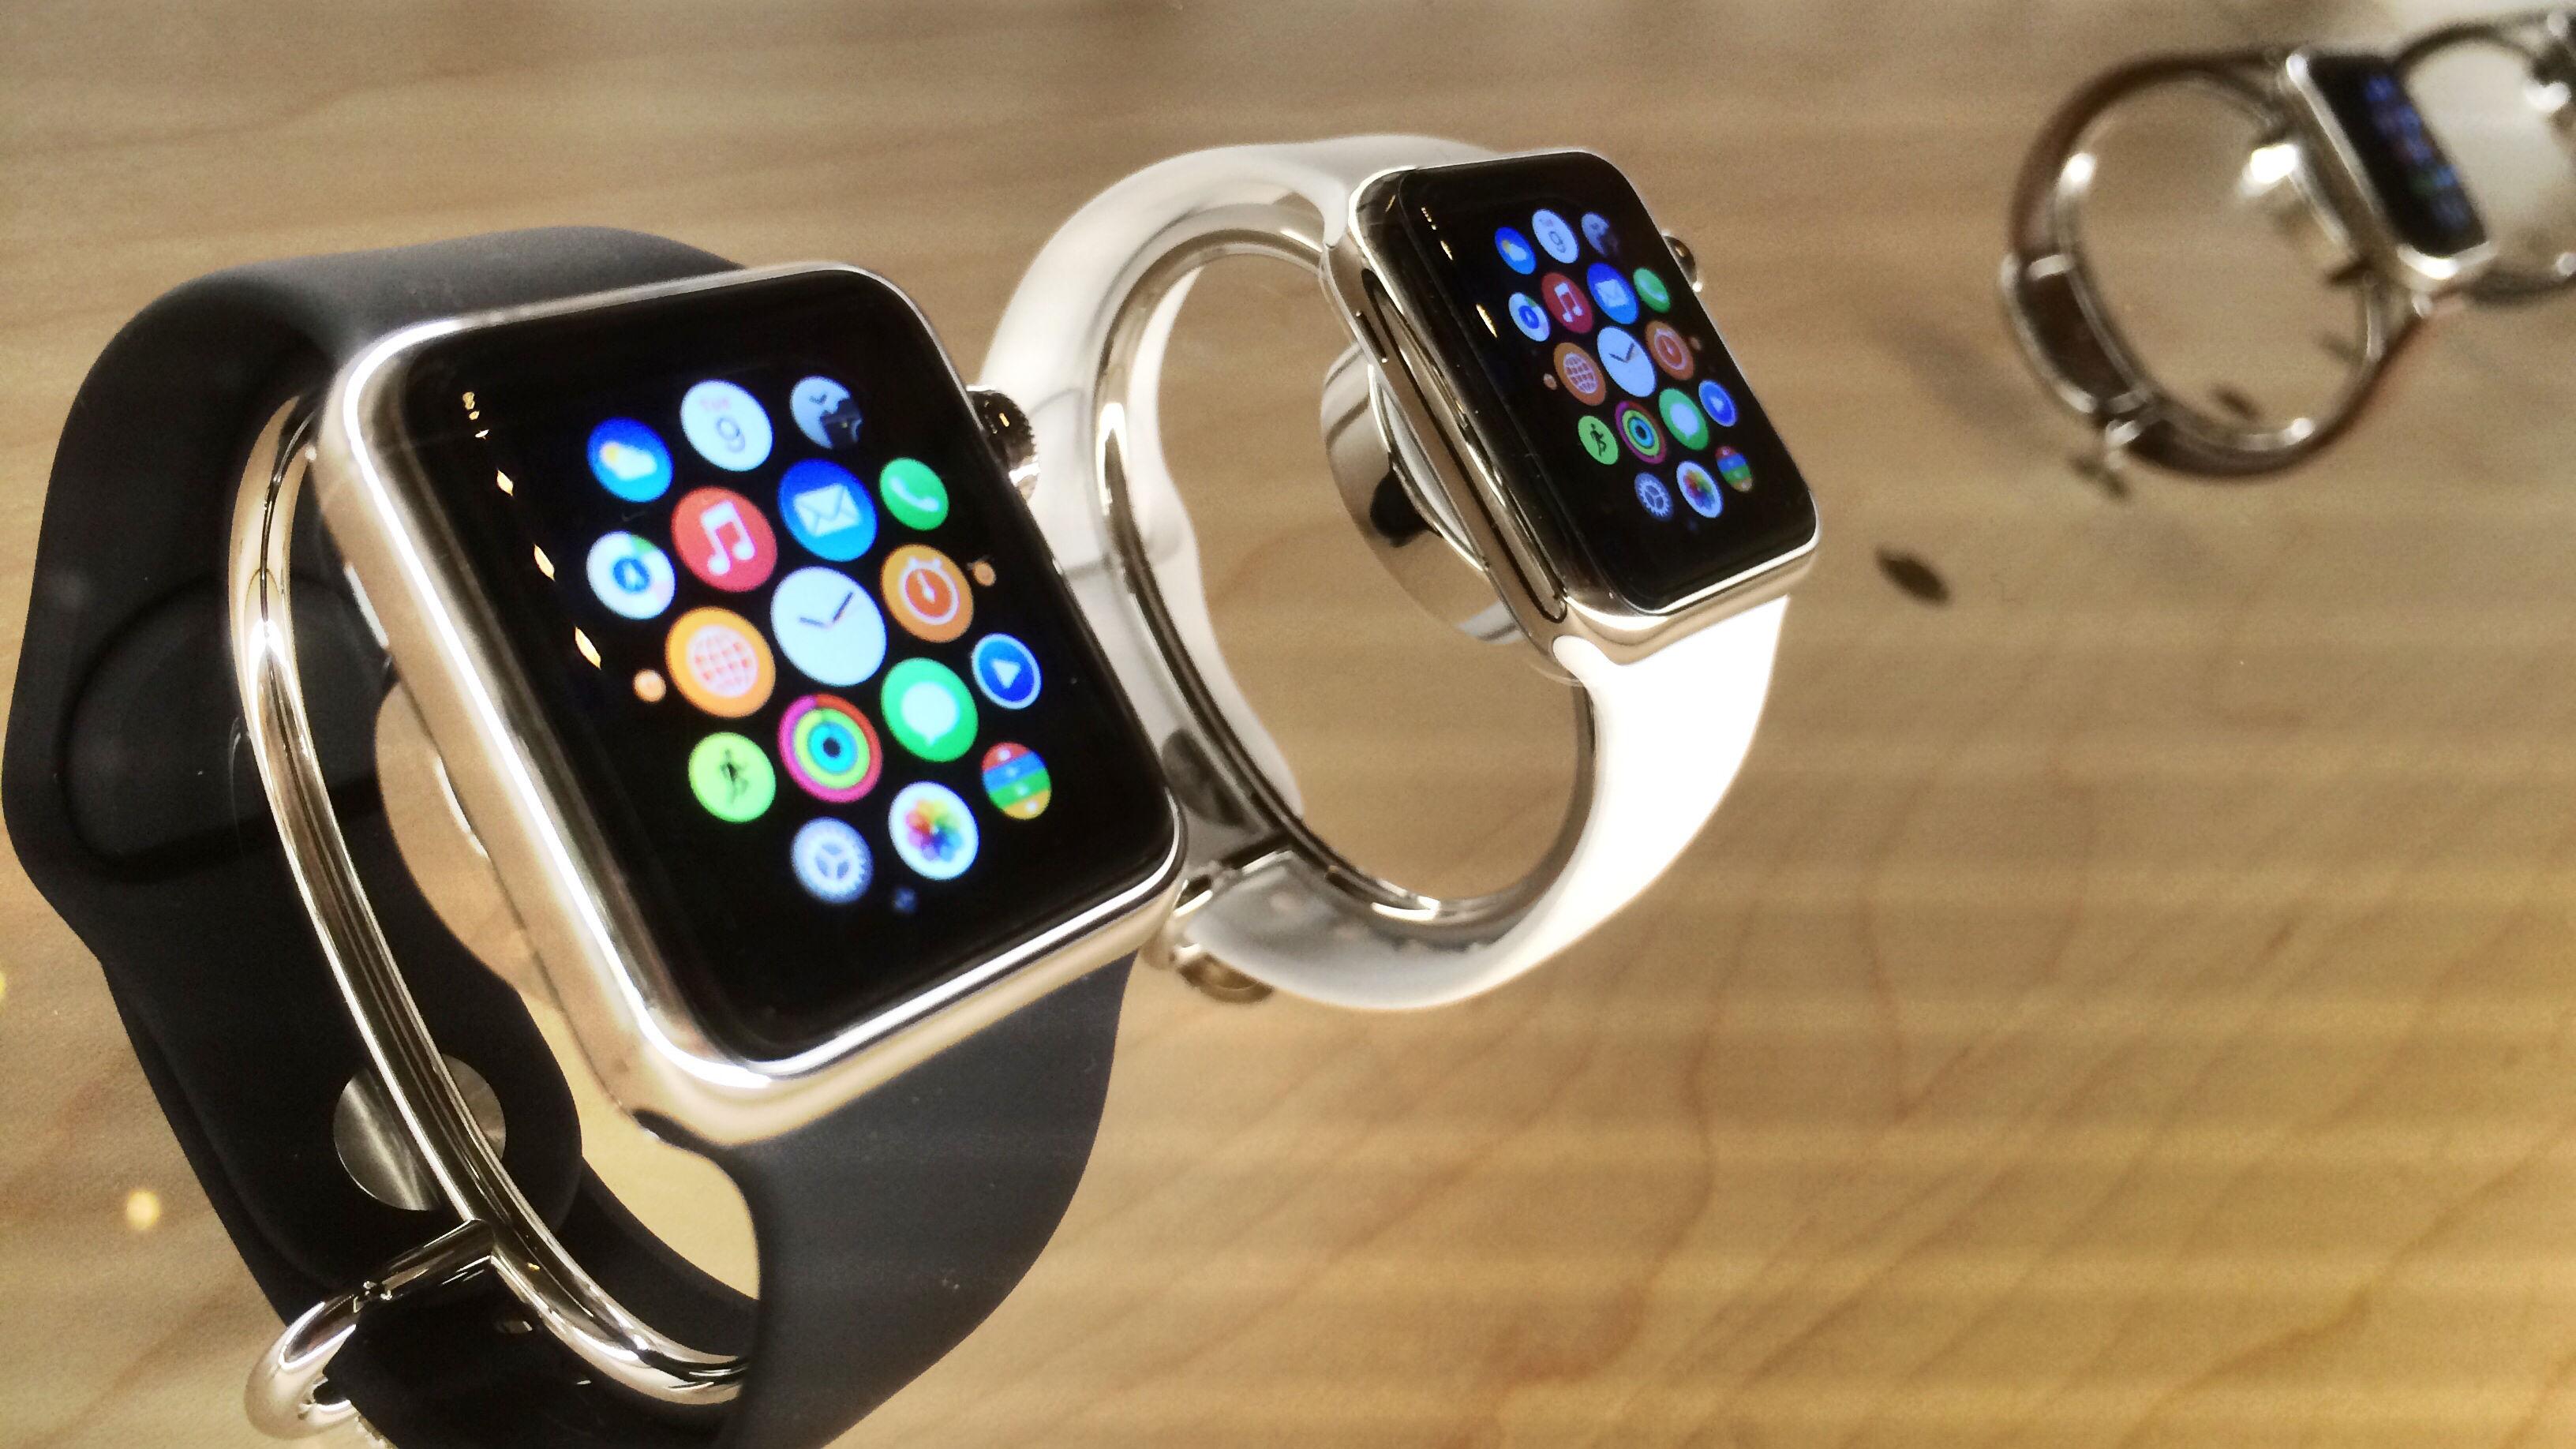 Apple Watch launch, Apr 10, 2015, by Shinya Suzuki, 01 (3264x1836)